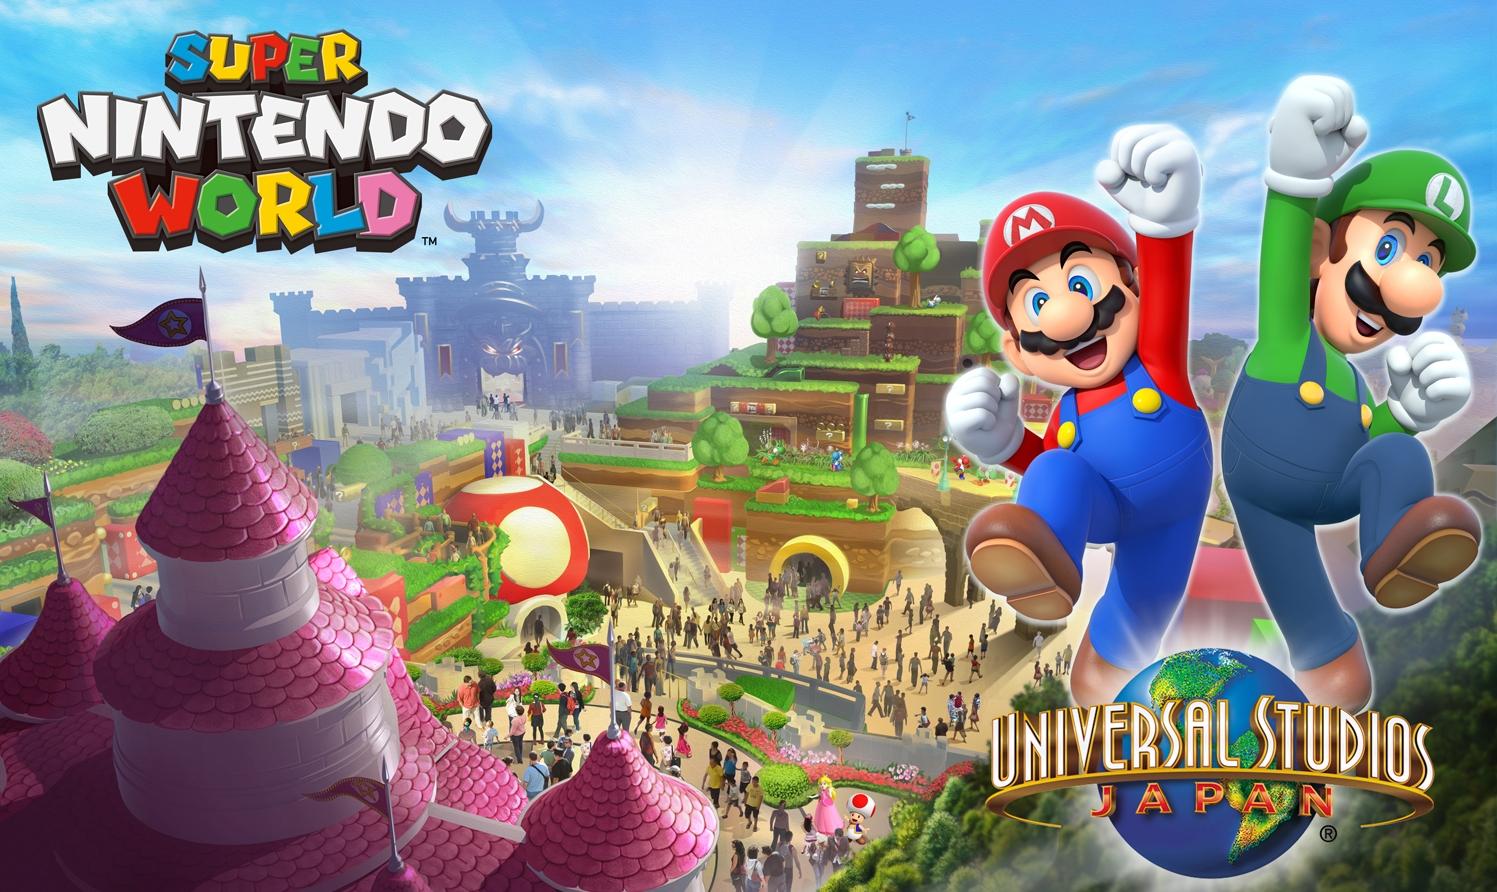 Universal Studios Japan Shows Off New Photo Of Upcoming Super Nintendo World